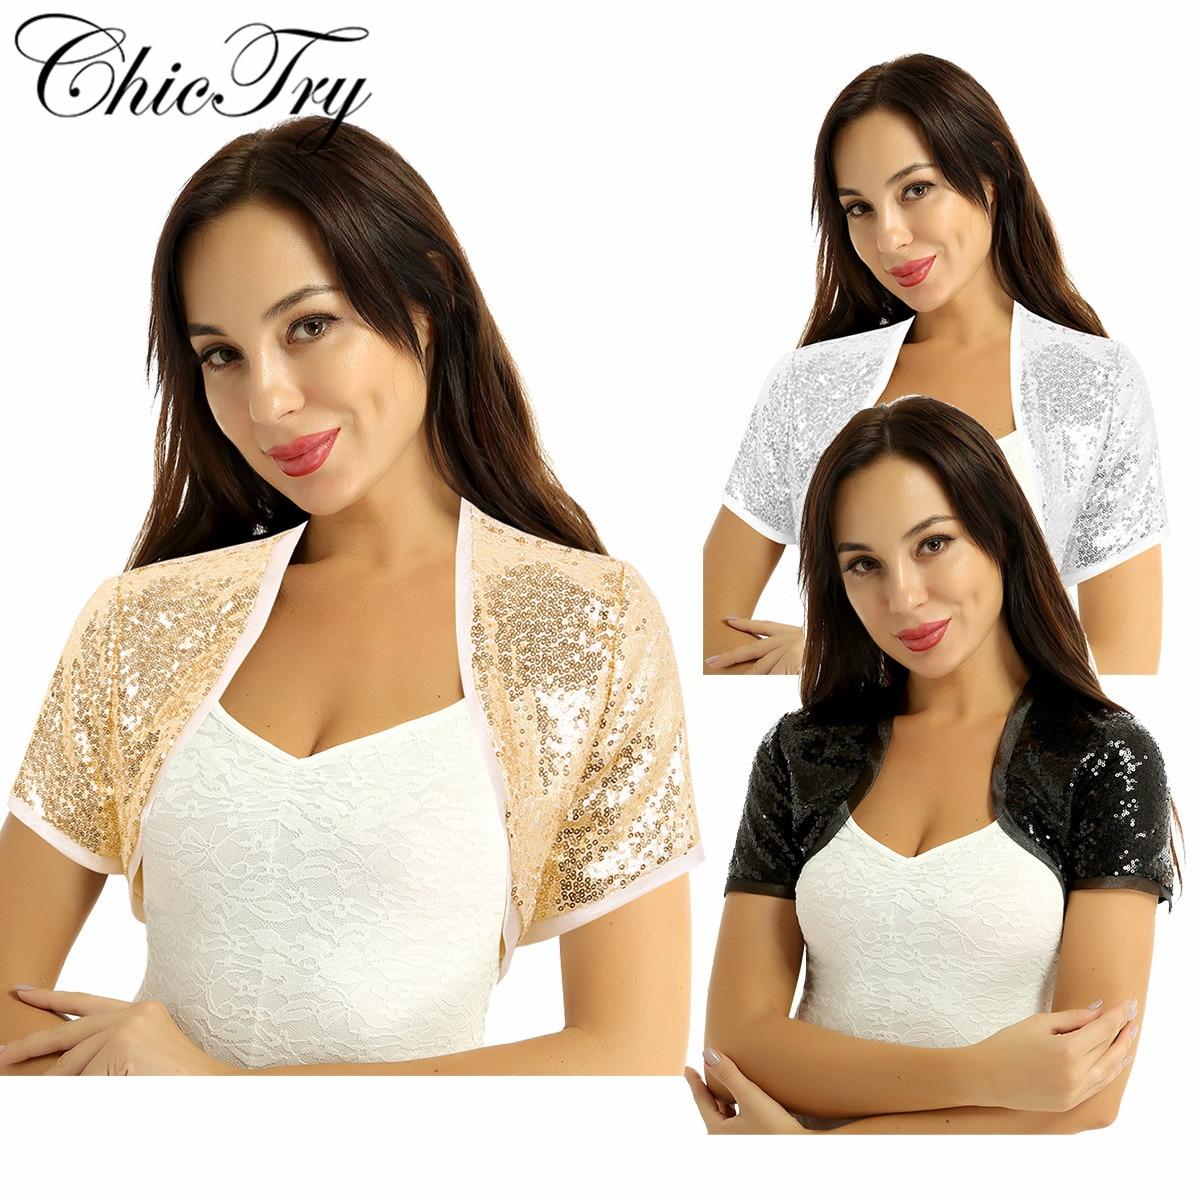 CHICTRY Womens Fashion Half Bell Sleeve Floral Lace Bolero Shrug Shawl Cardigan Top